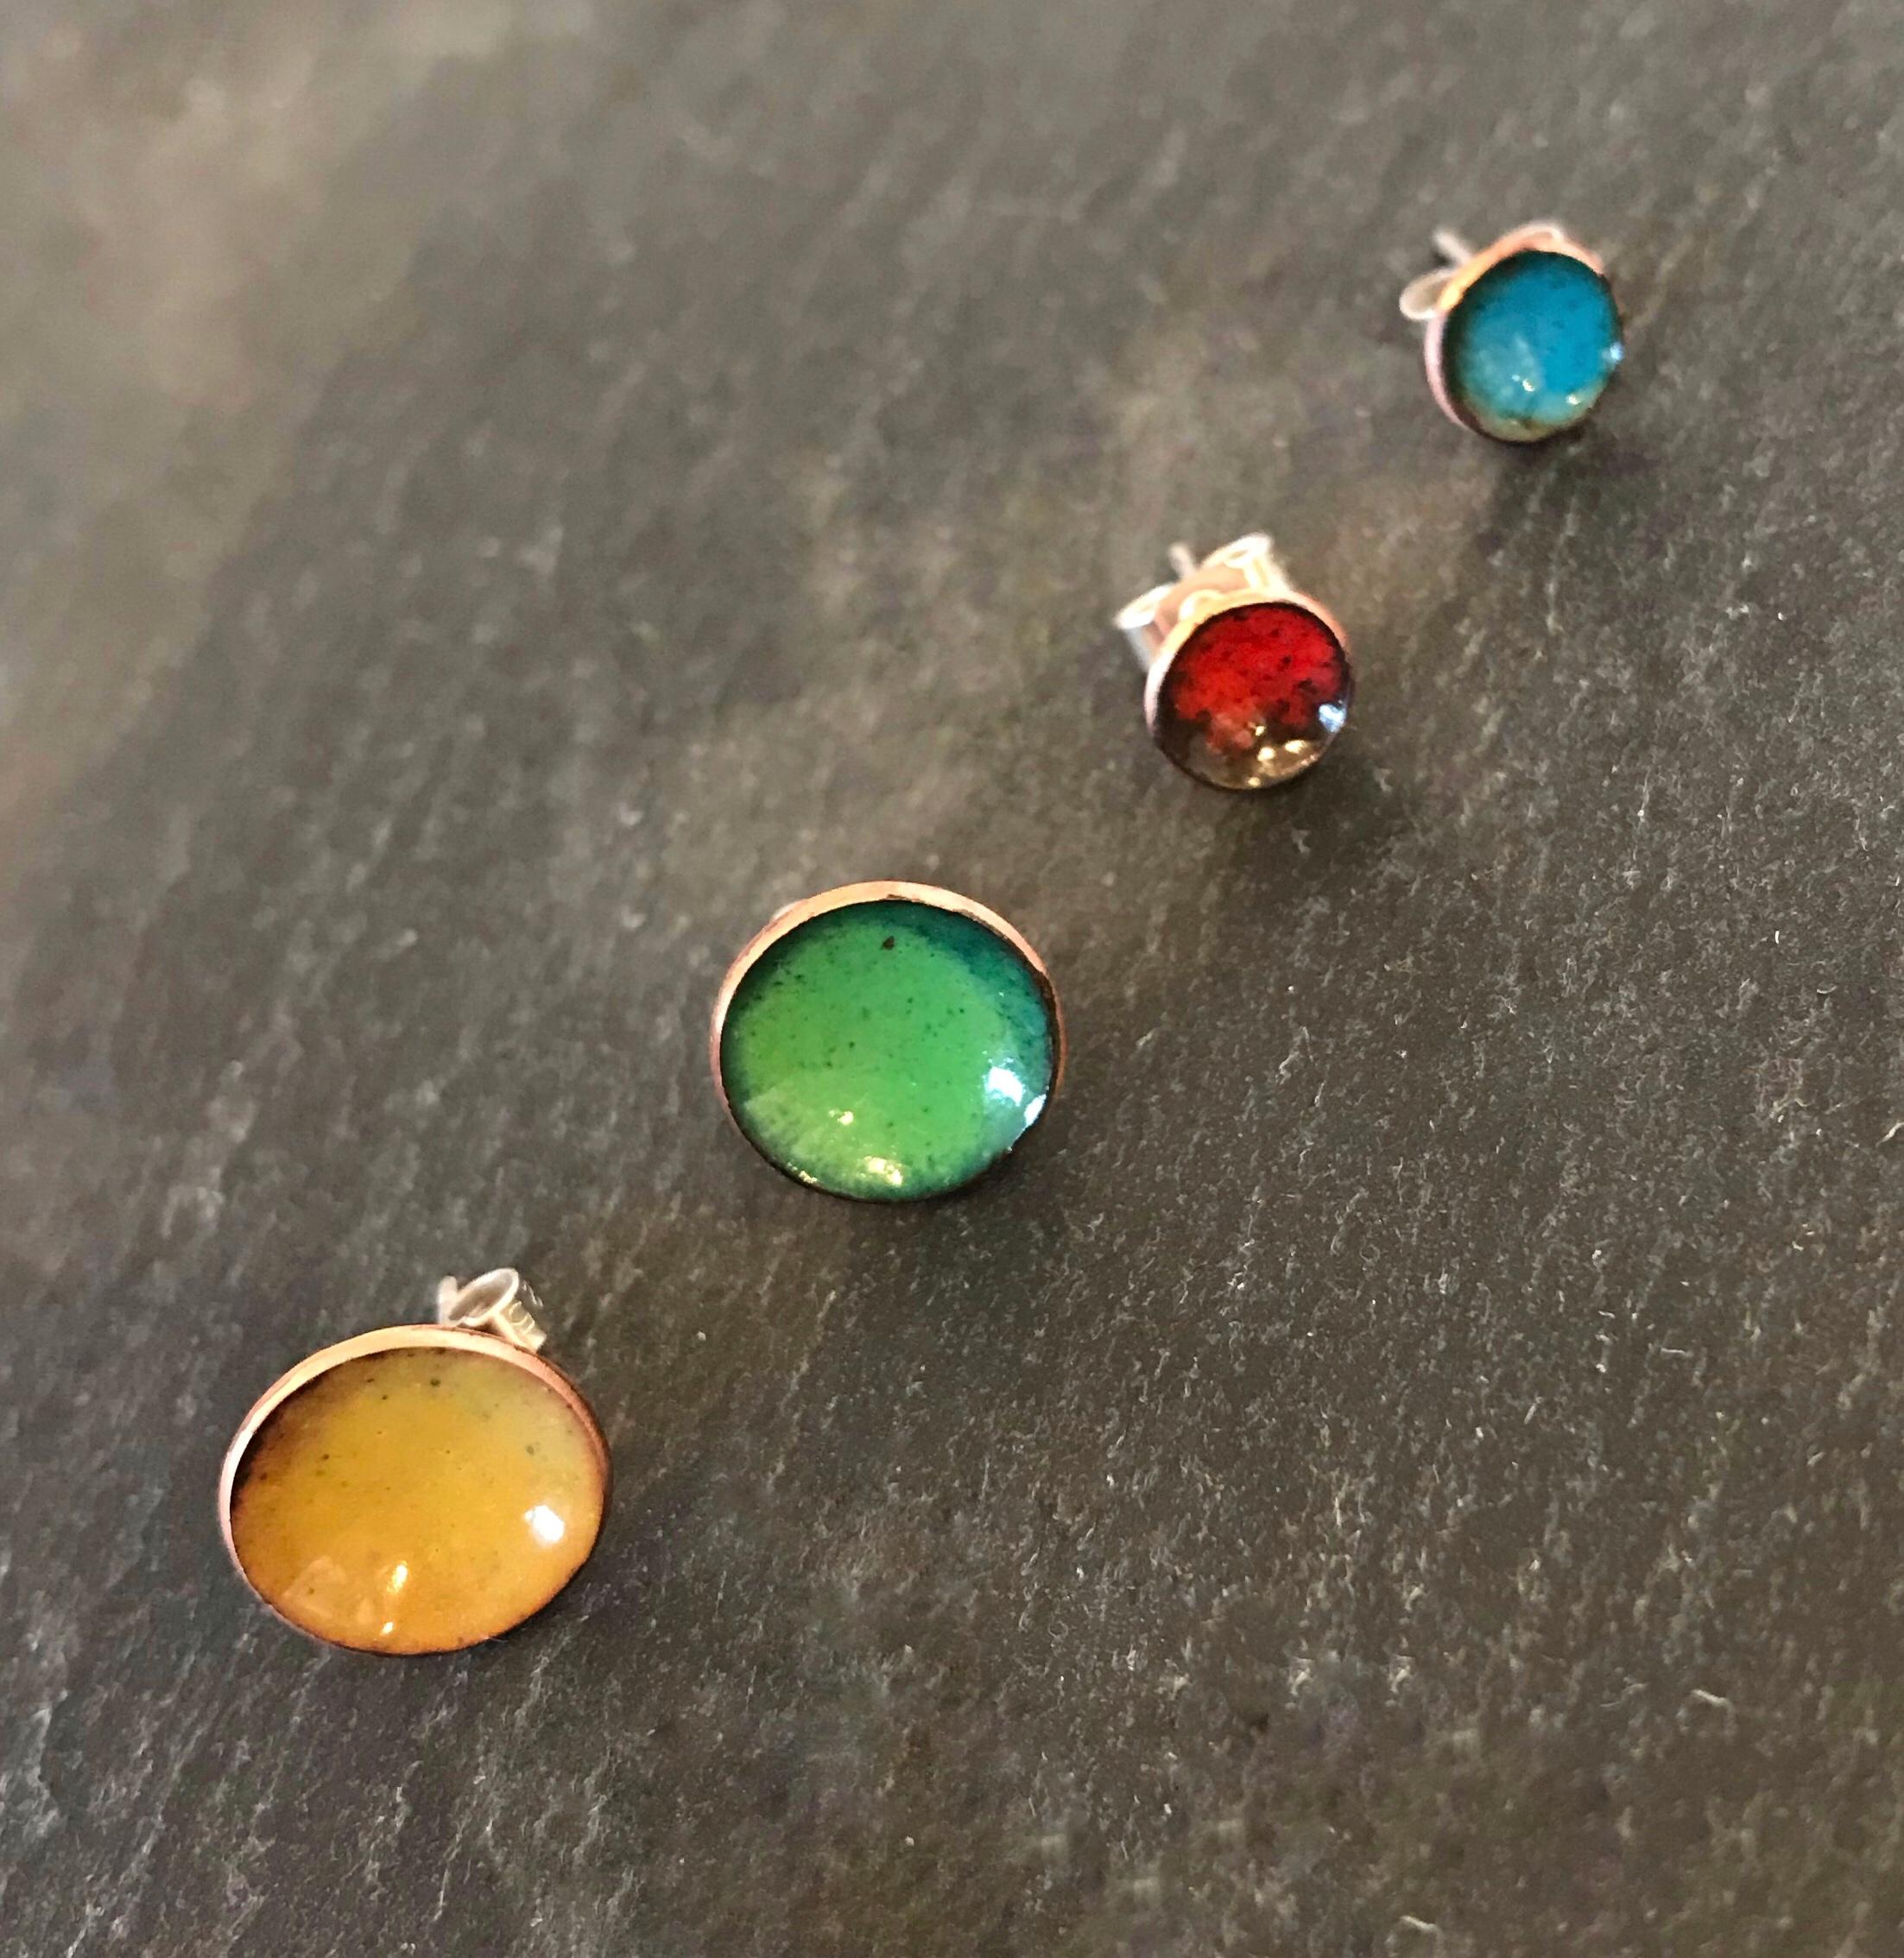 c44078a10 duo random coloured concave copper enamel stud earrings - My Cherry Pie